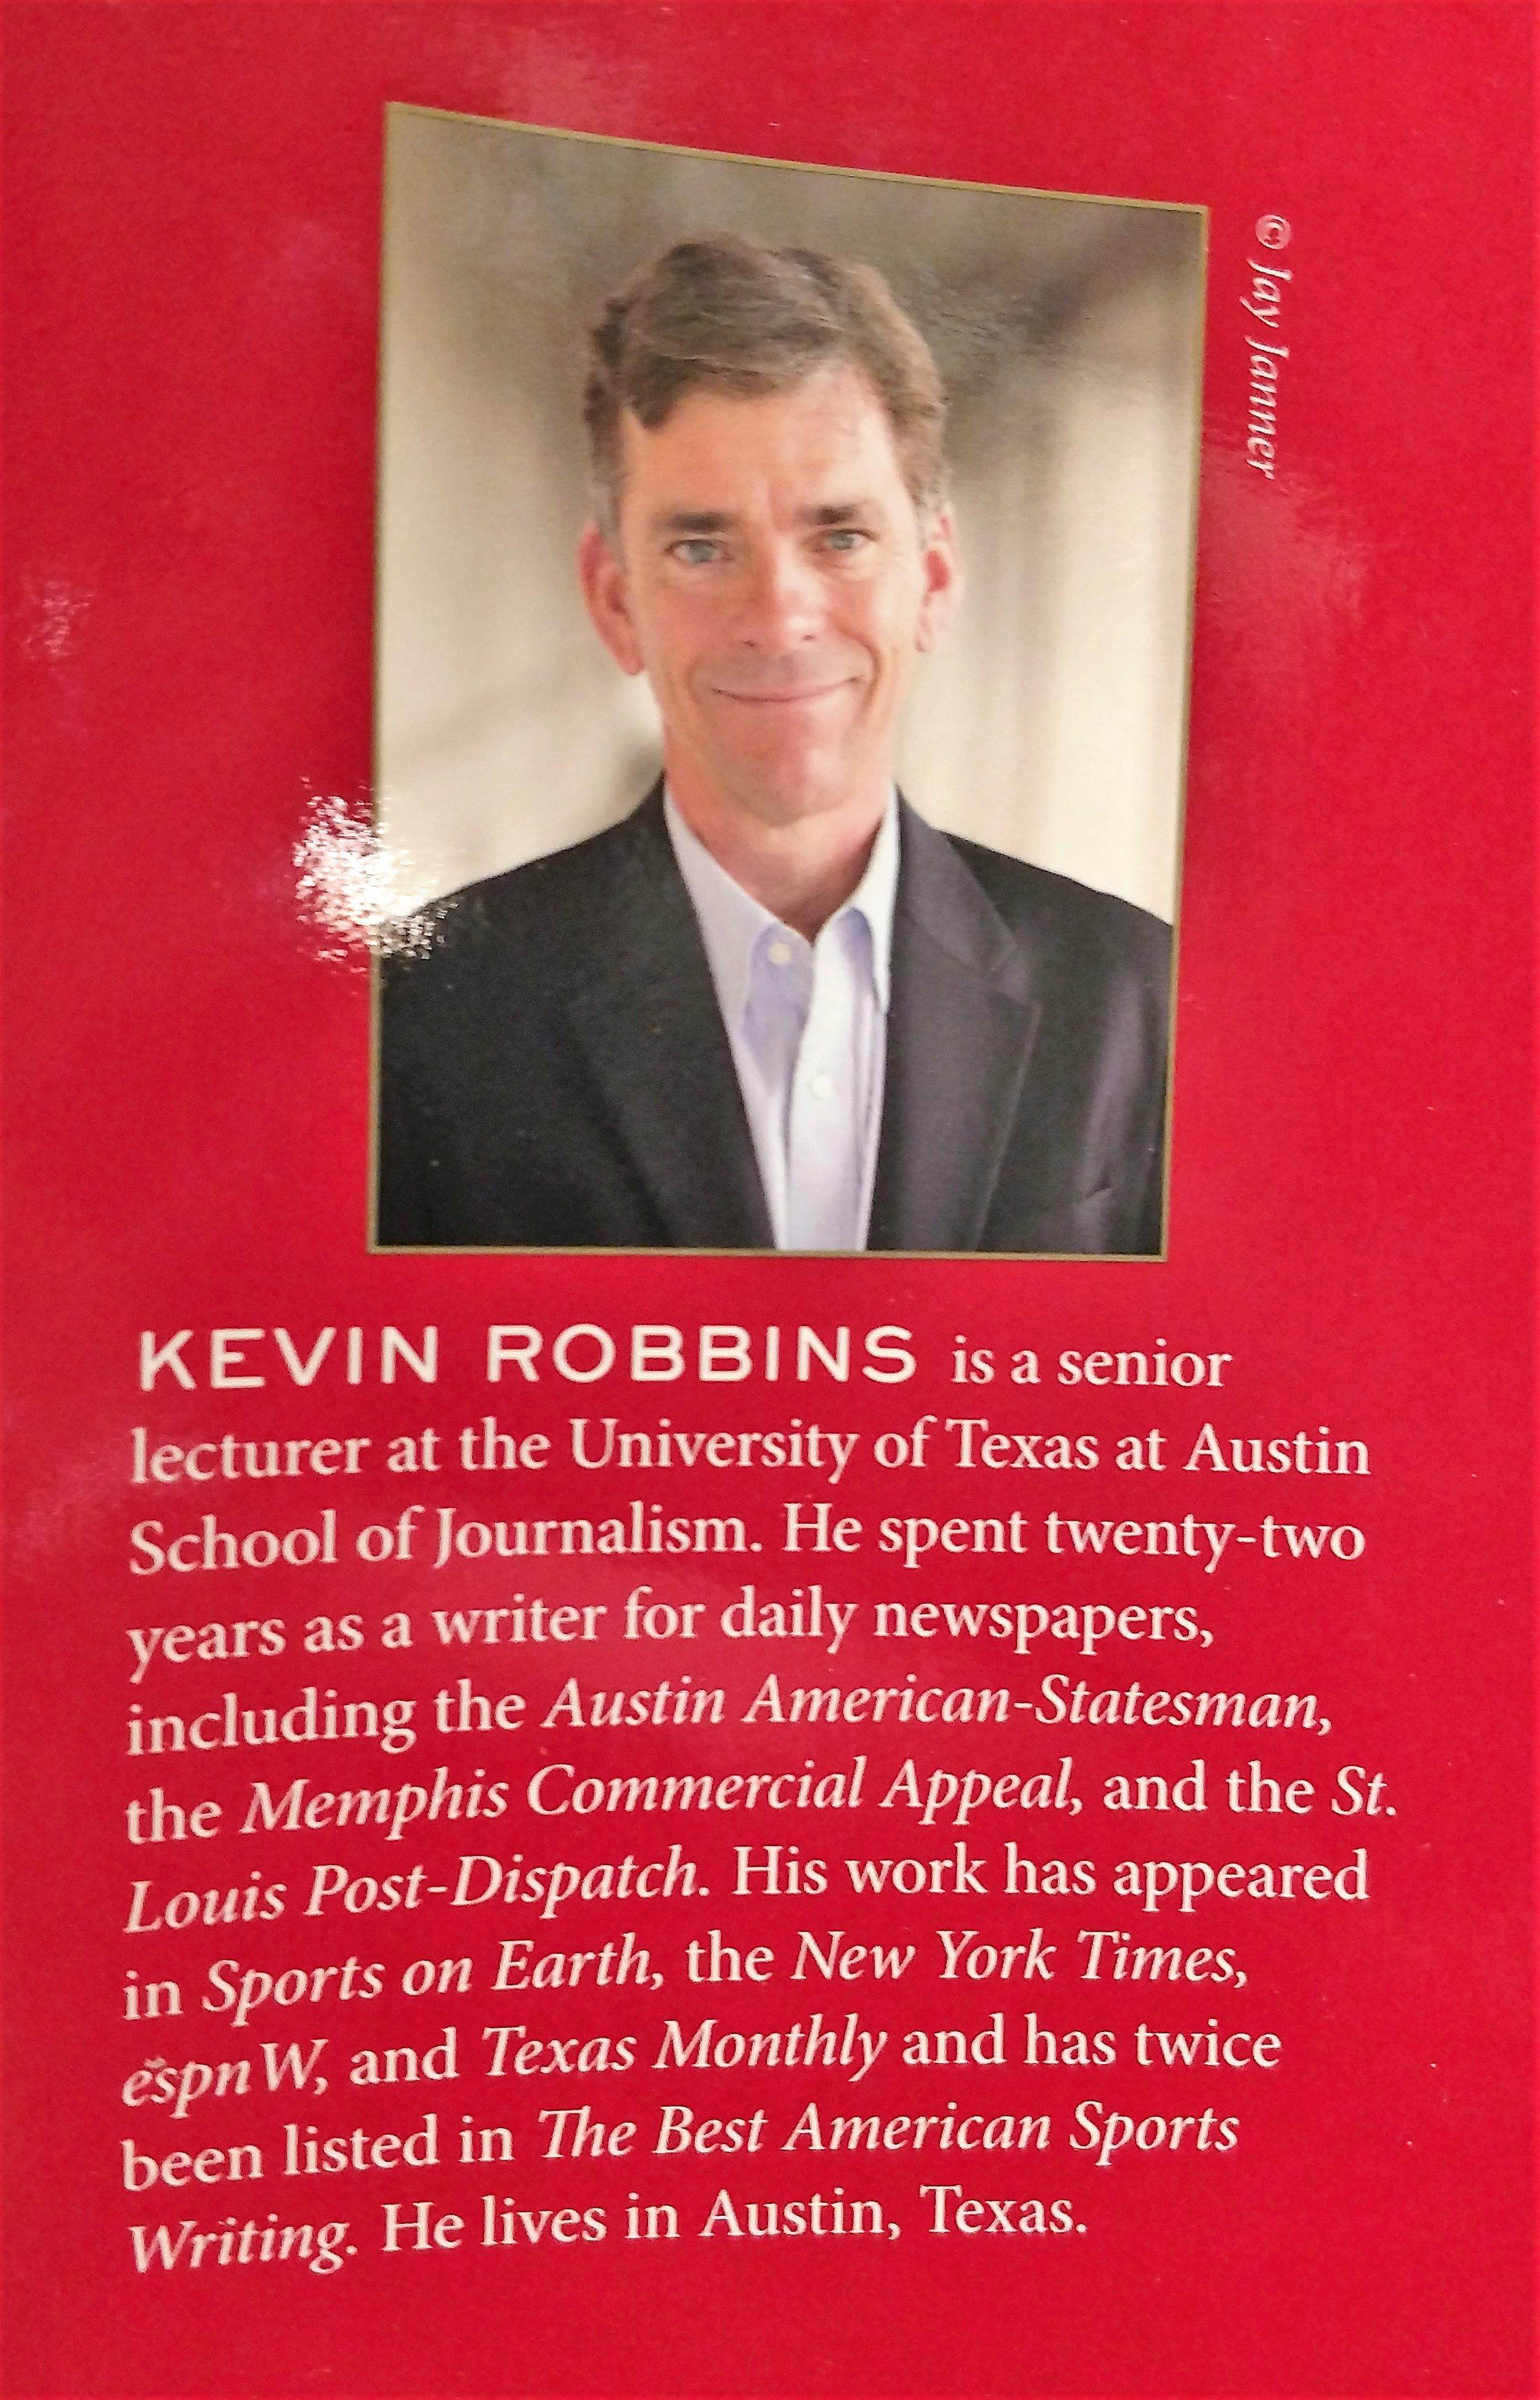 Kevin Robbins